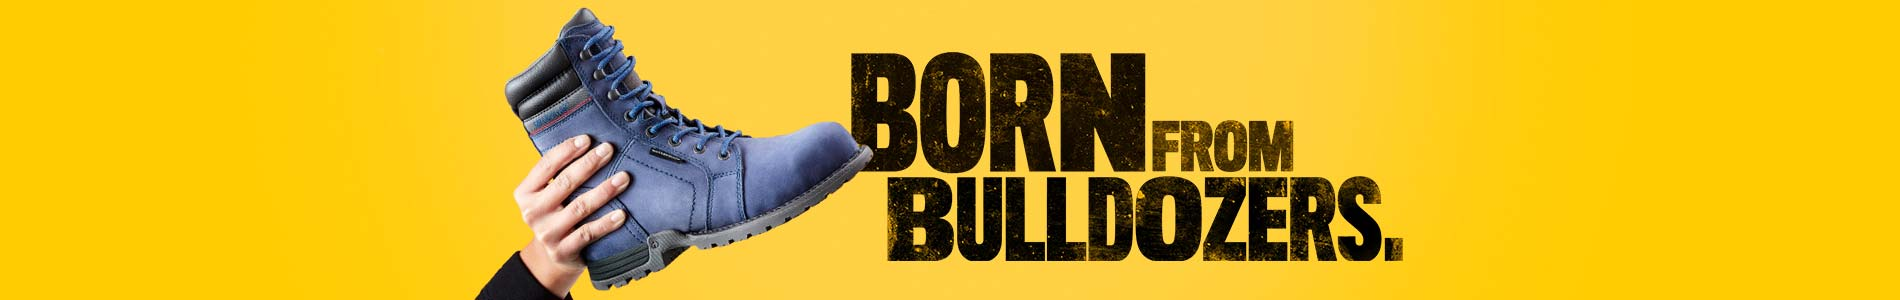 Born From Bulldozers.